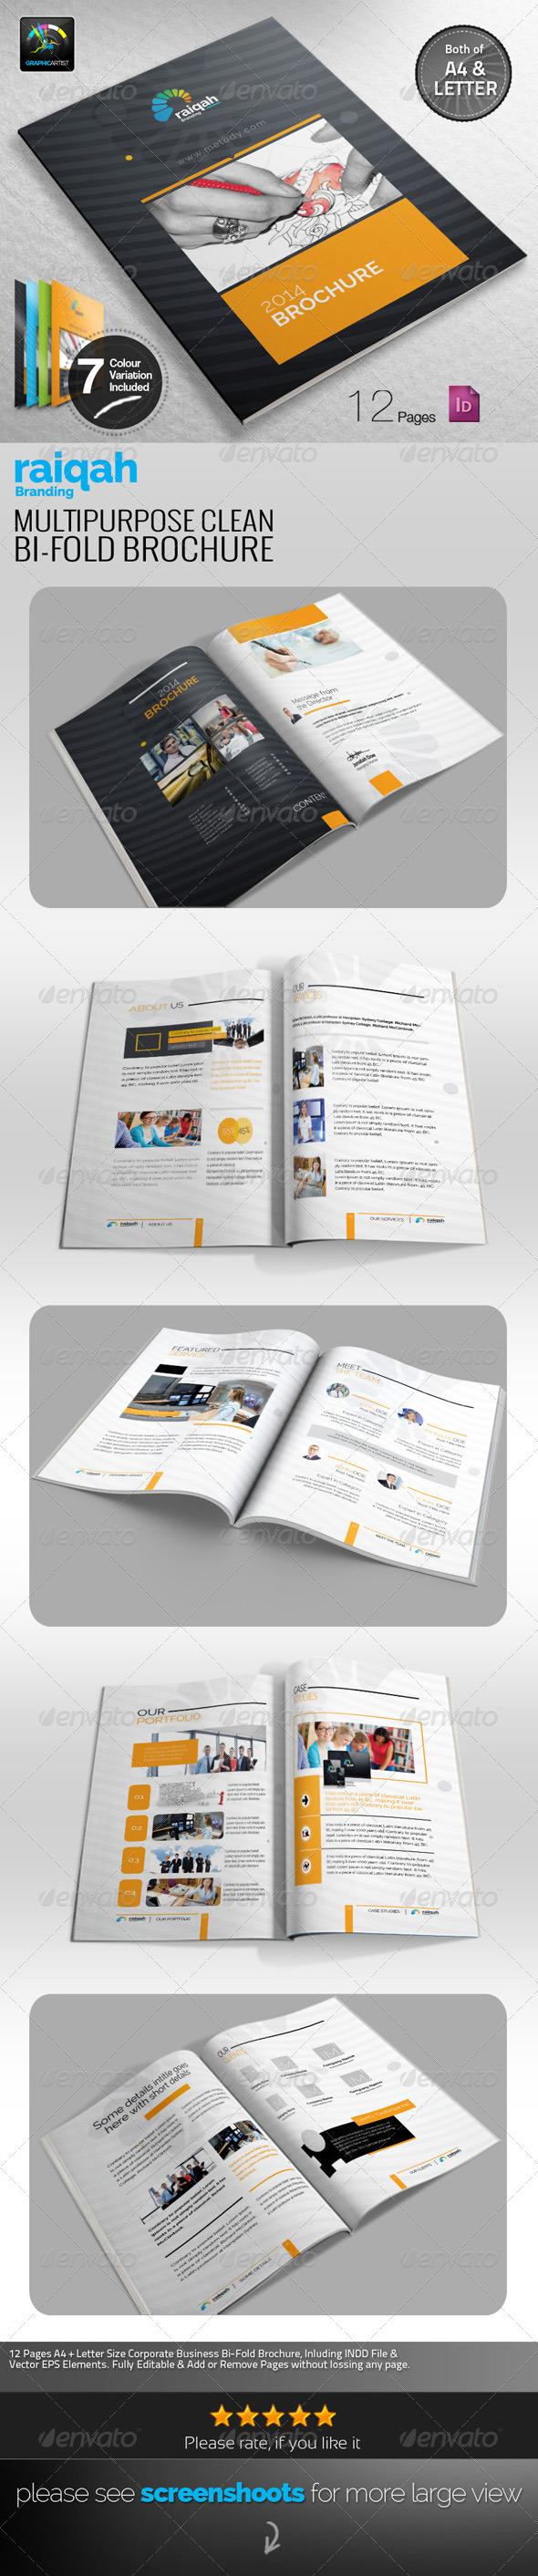 GraphicRiver Raiqah Multipurpose Bi-fold Brochure 7788196